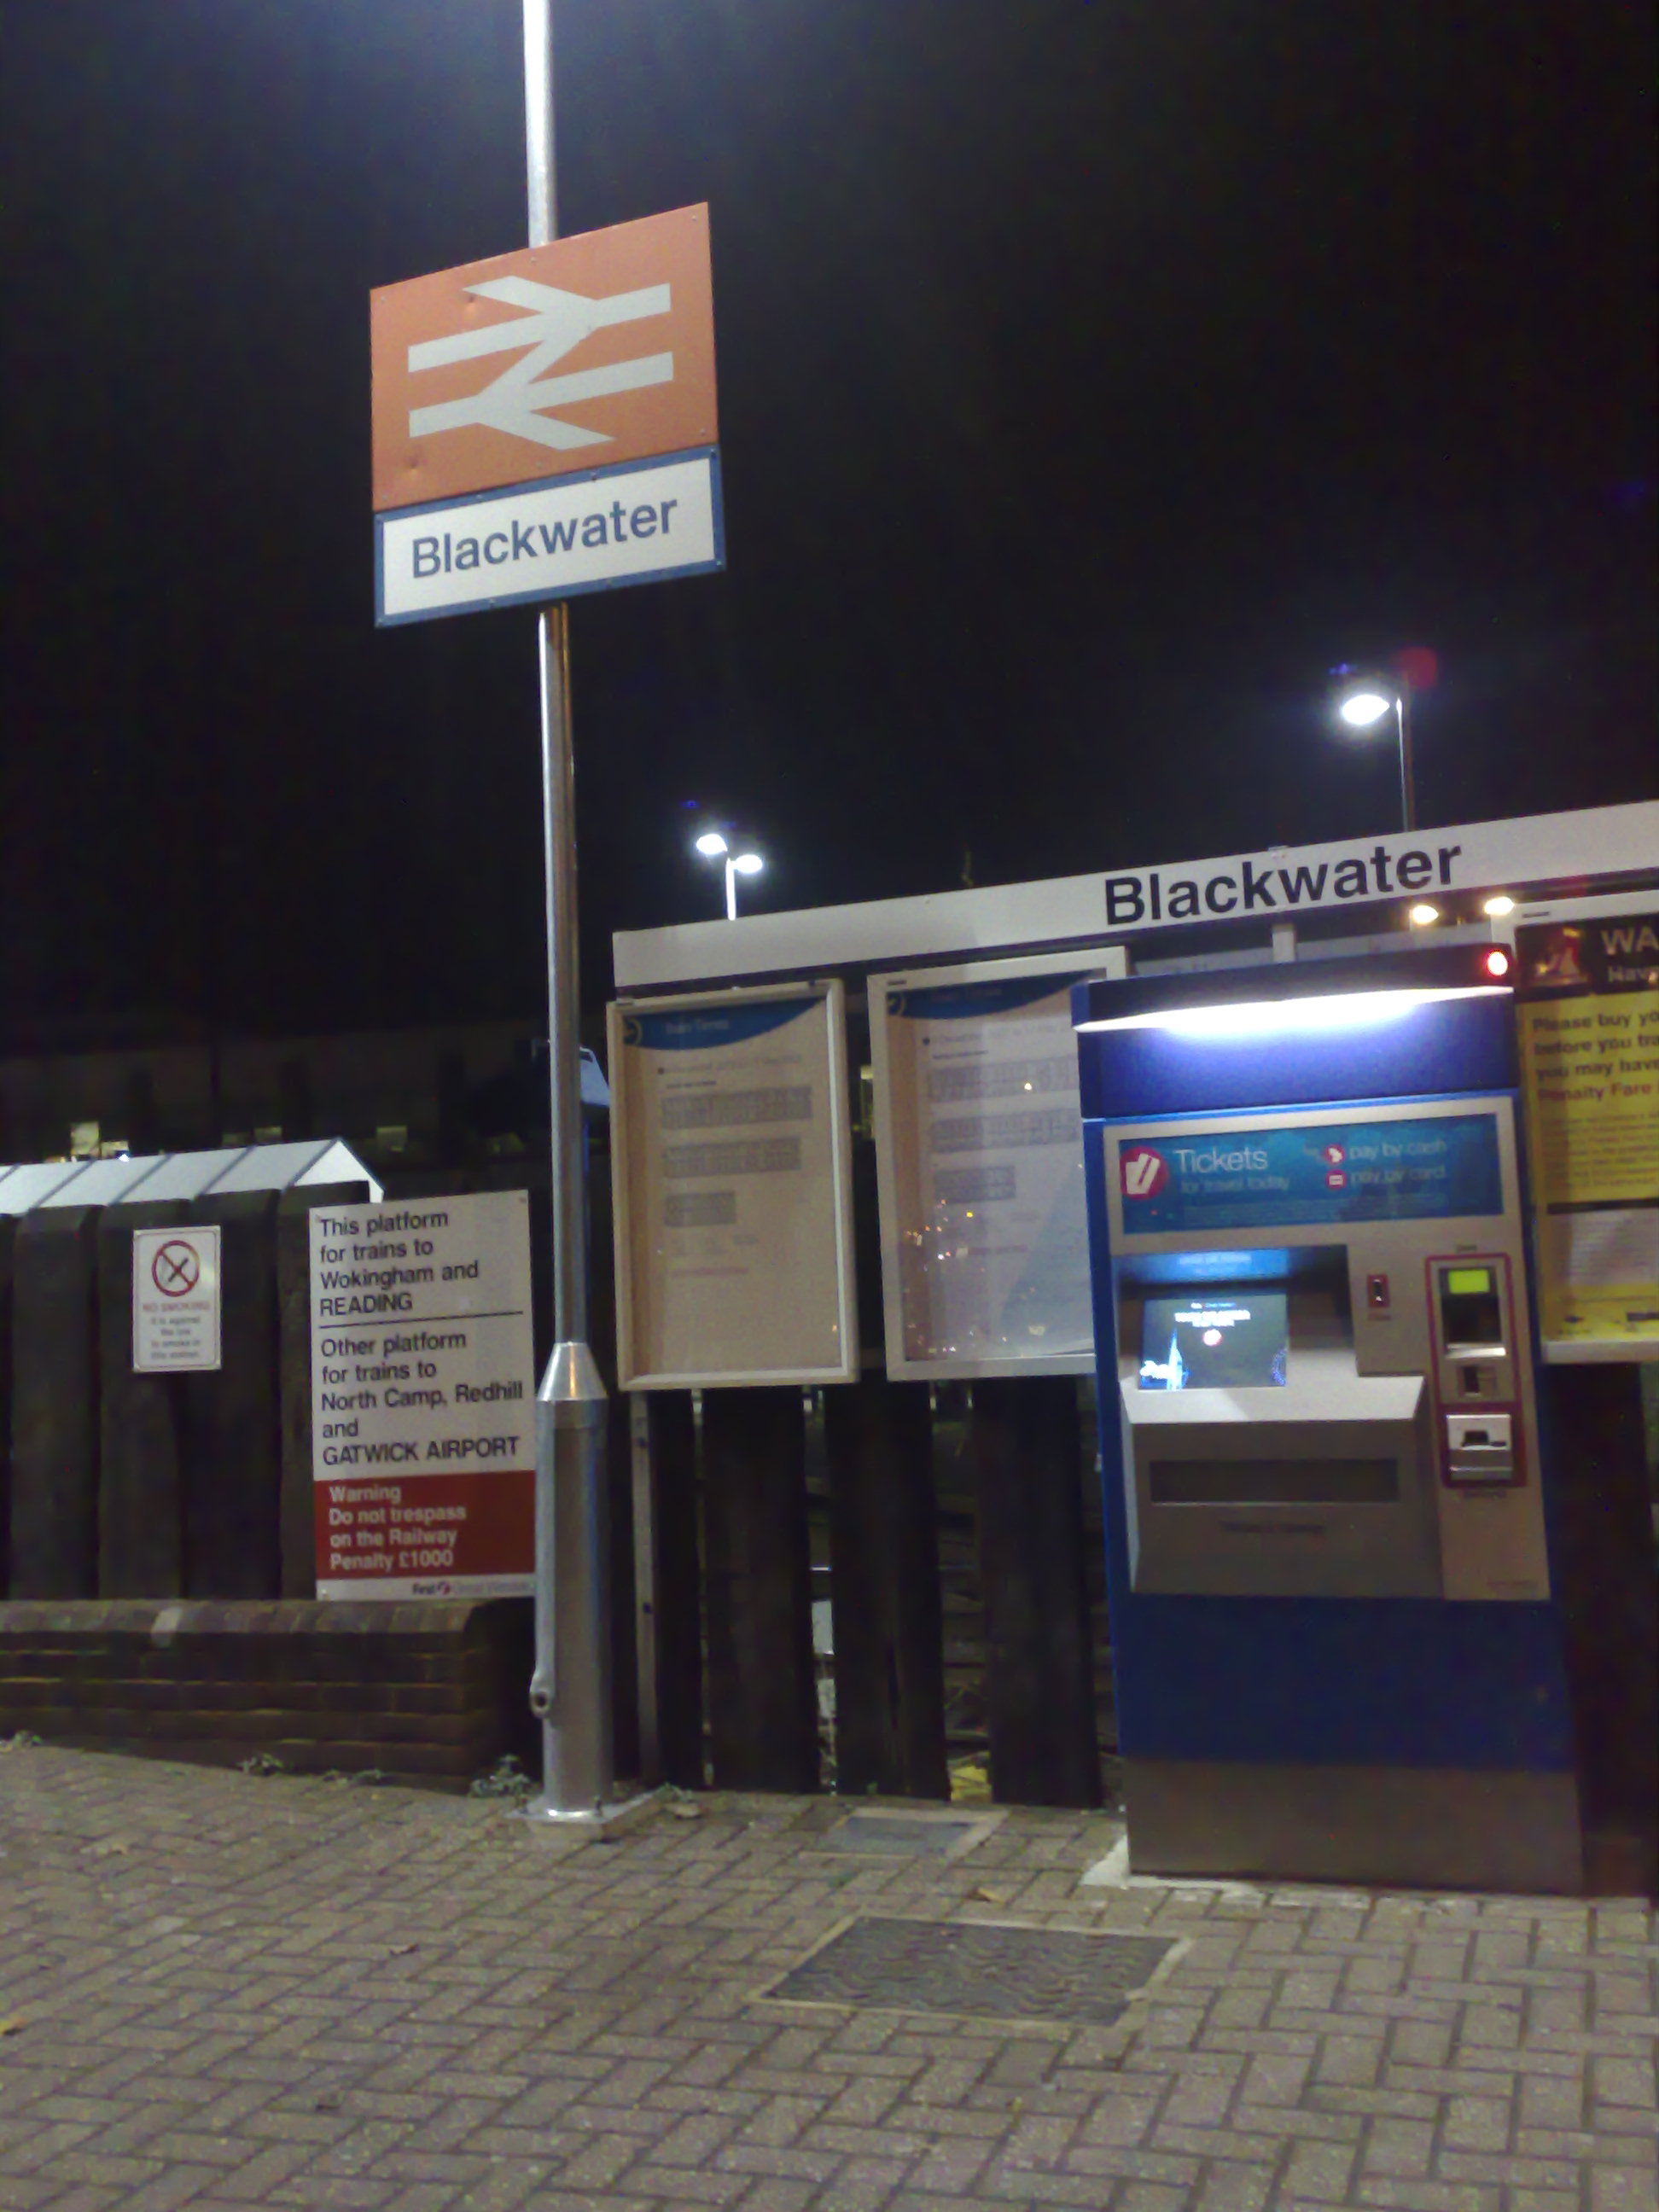 Station Blackwater